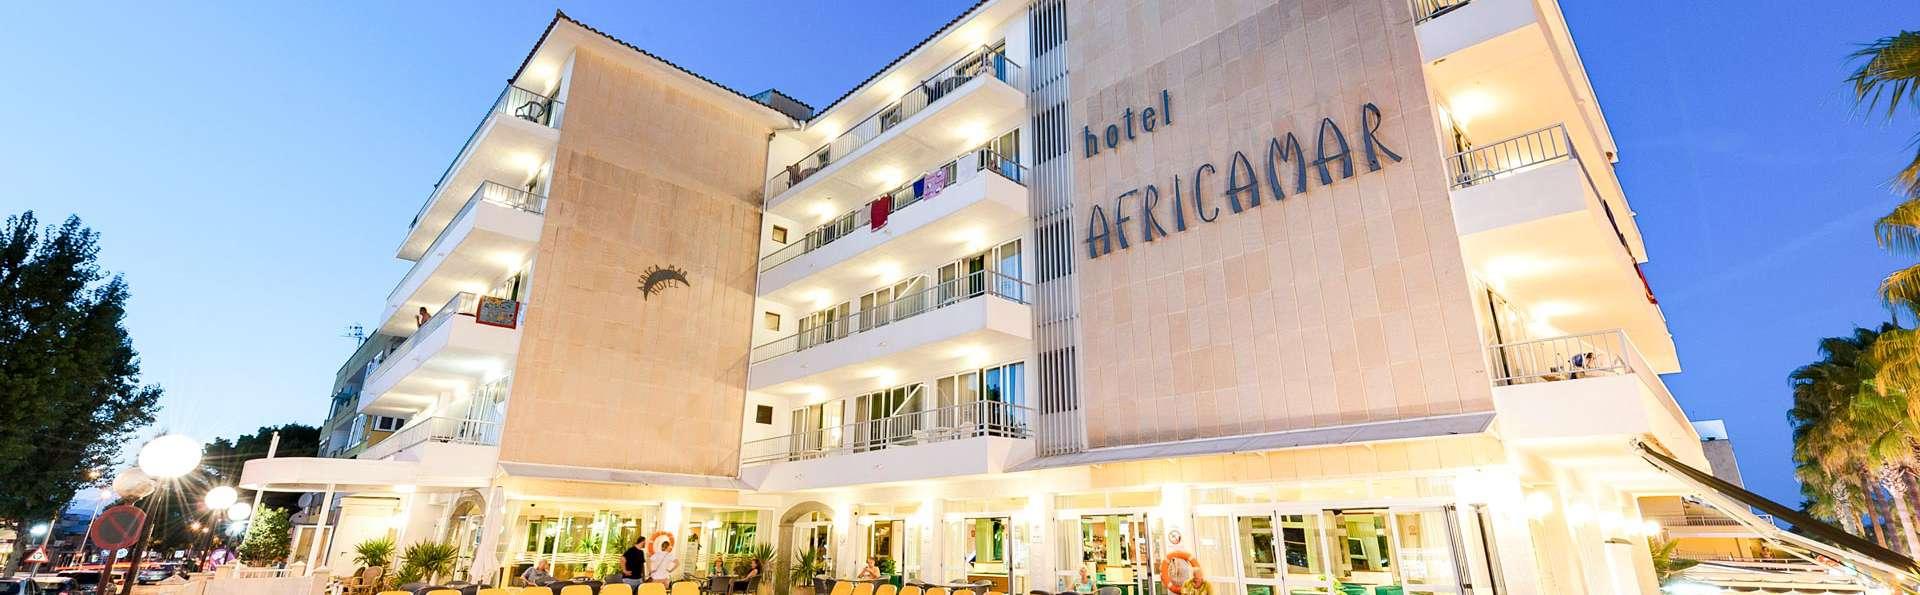 Aparthotel Africamar - EDIT_FRONT_01.jpg